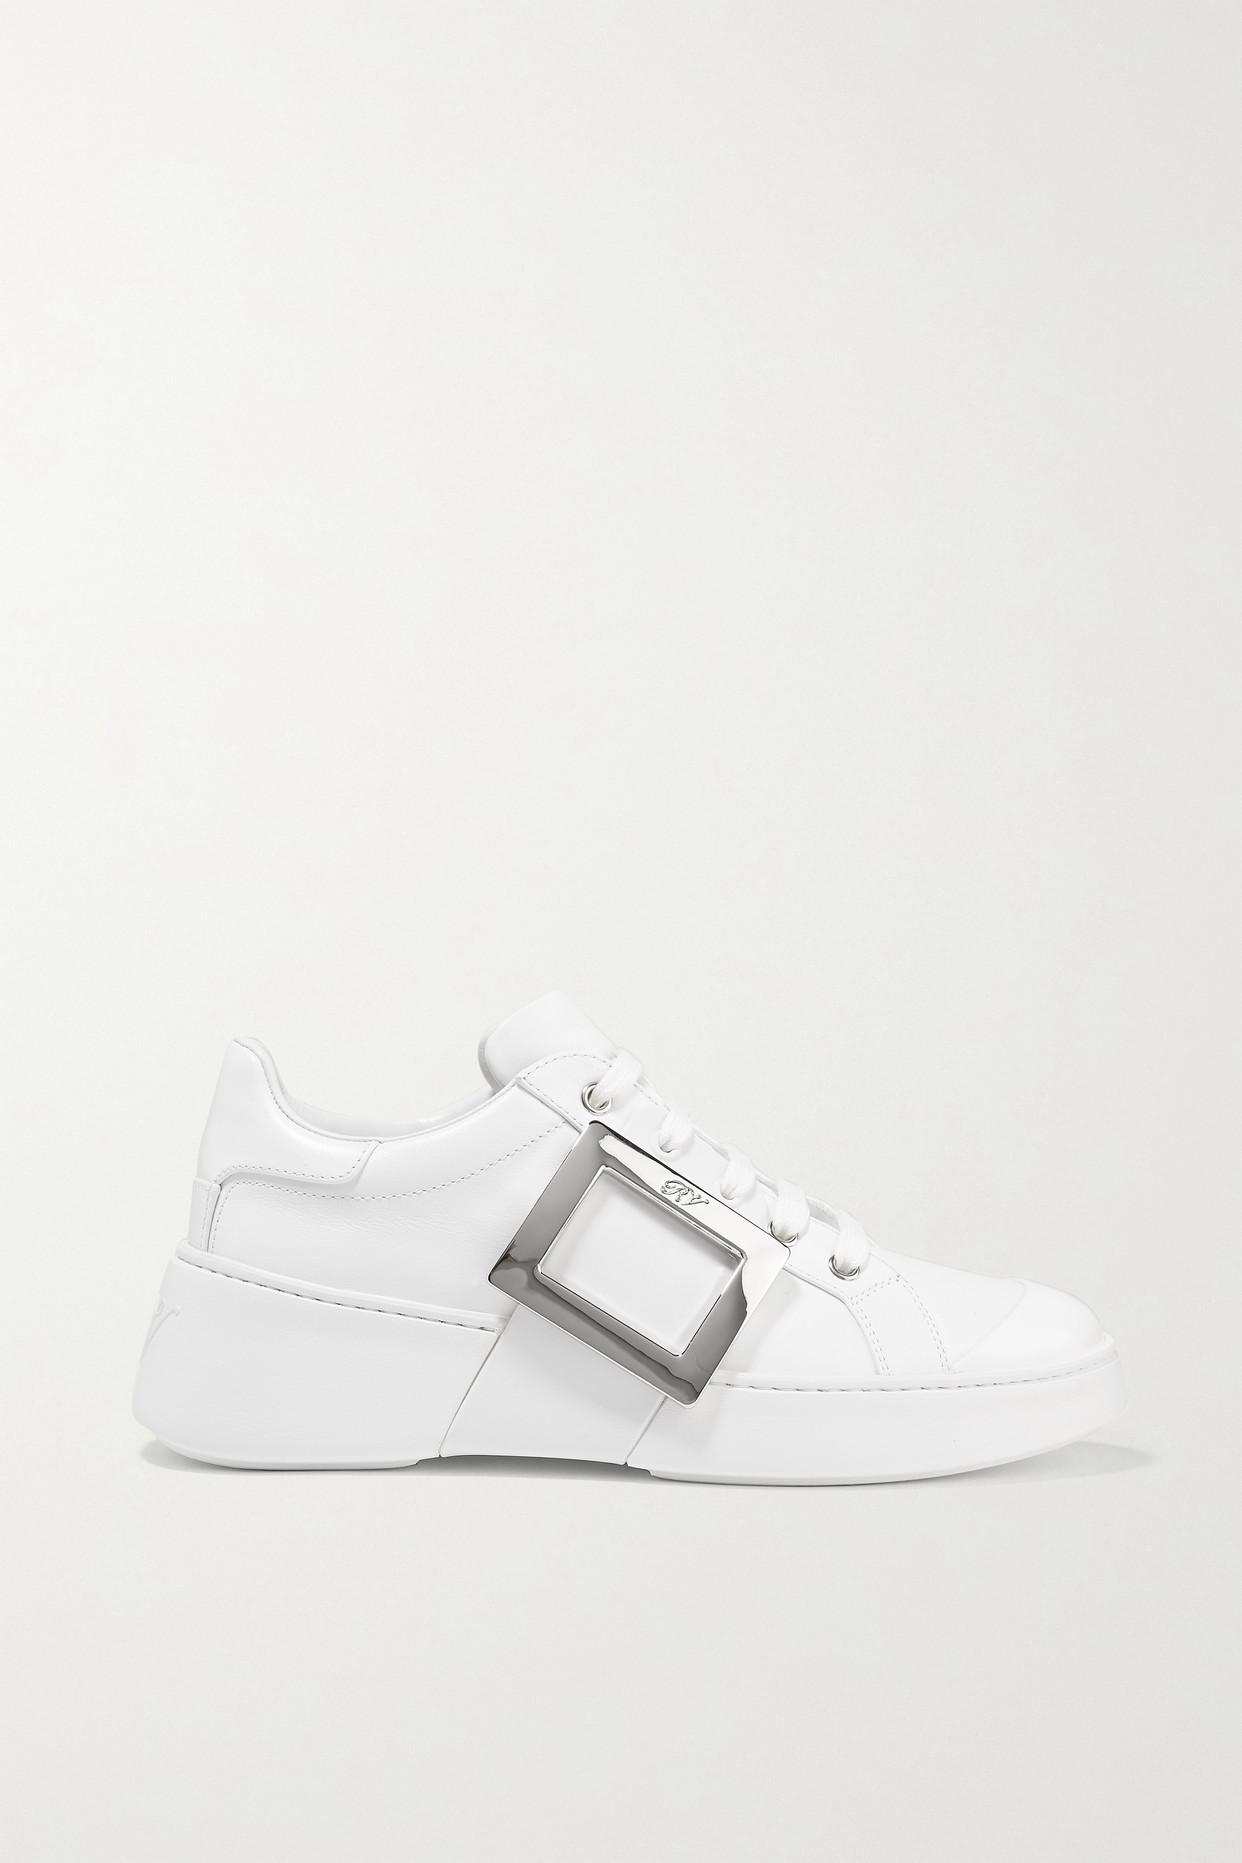 ROGER VIVIER - Skate Embellished Rubber-trimmed Leather Sneakers - White - IT38.5